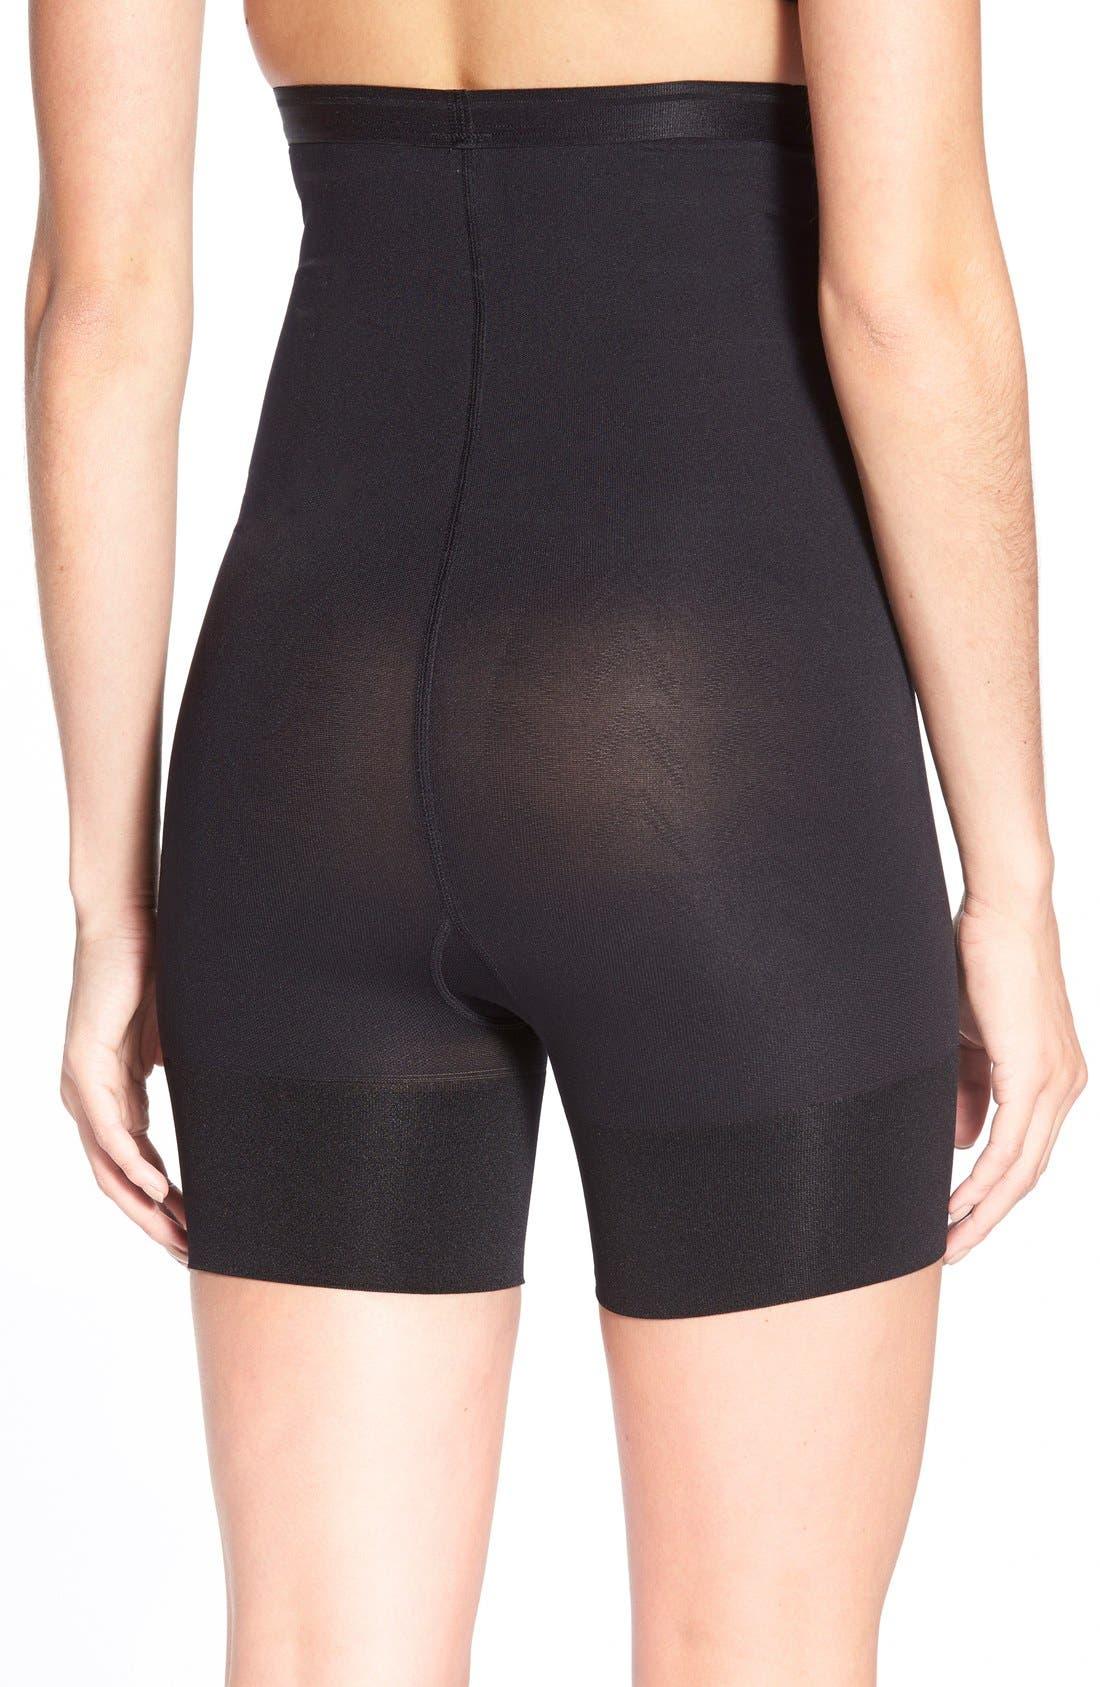 Shorty Shaping Shorts,                             Alternate thumbnail 4, color,                             BLACK